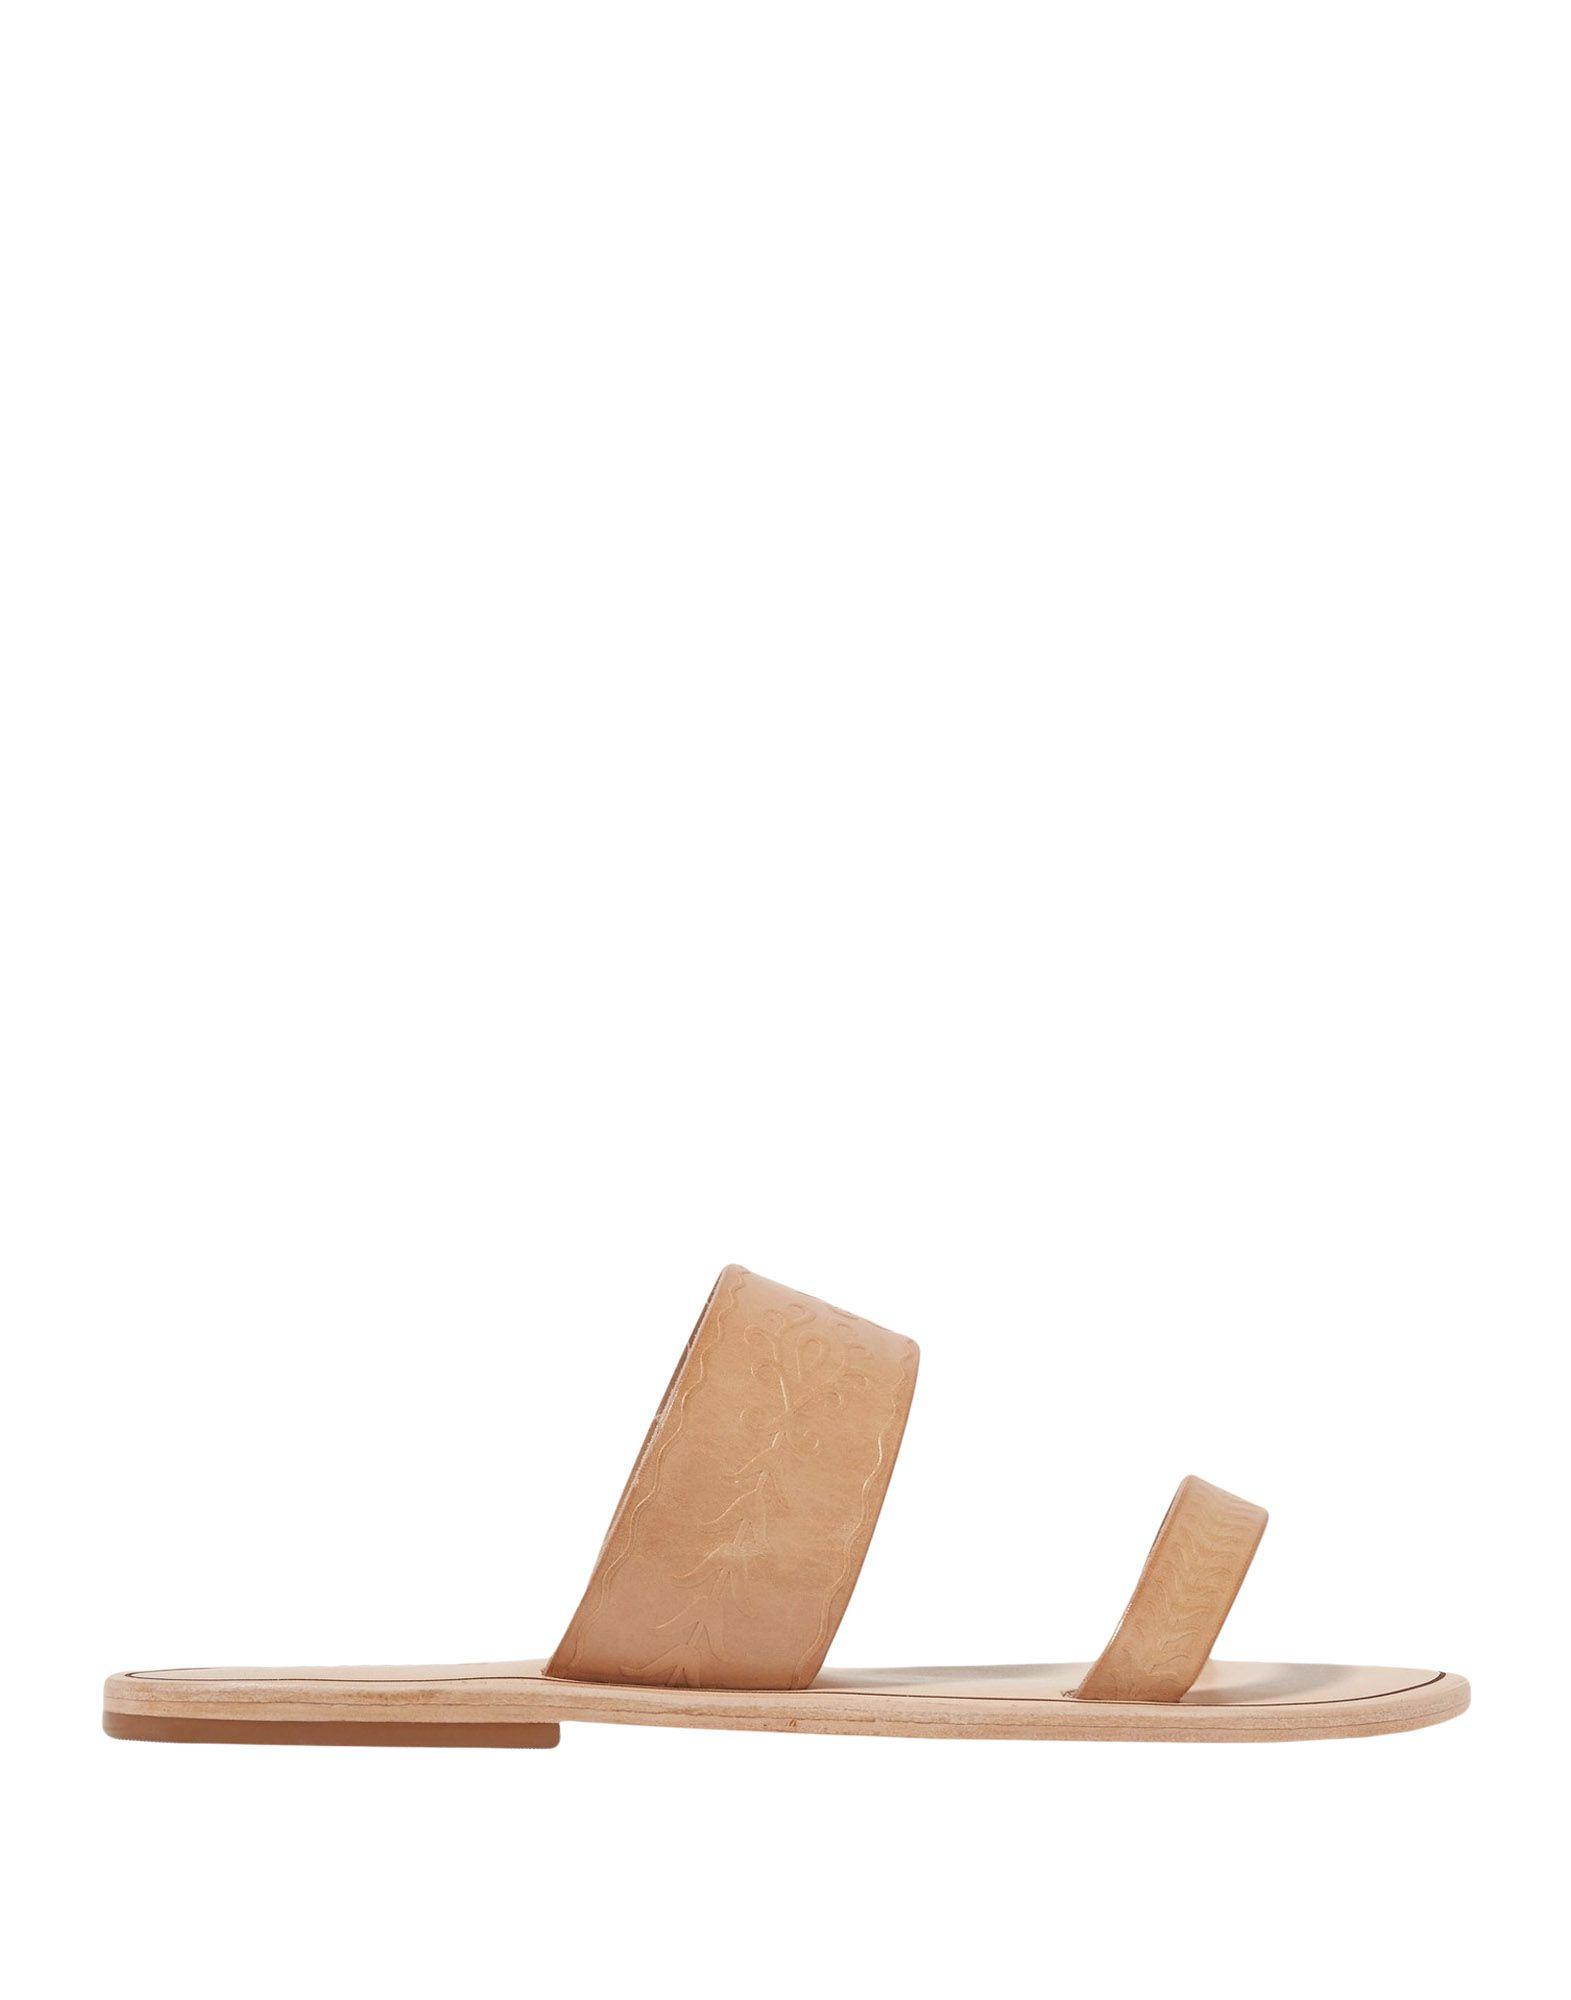 Schutz Sandalen Damen  11464218LT Gute Qualität beliebte Schuhe